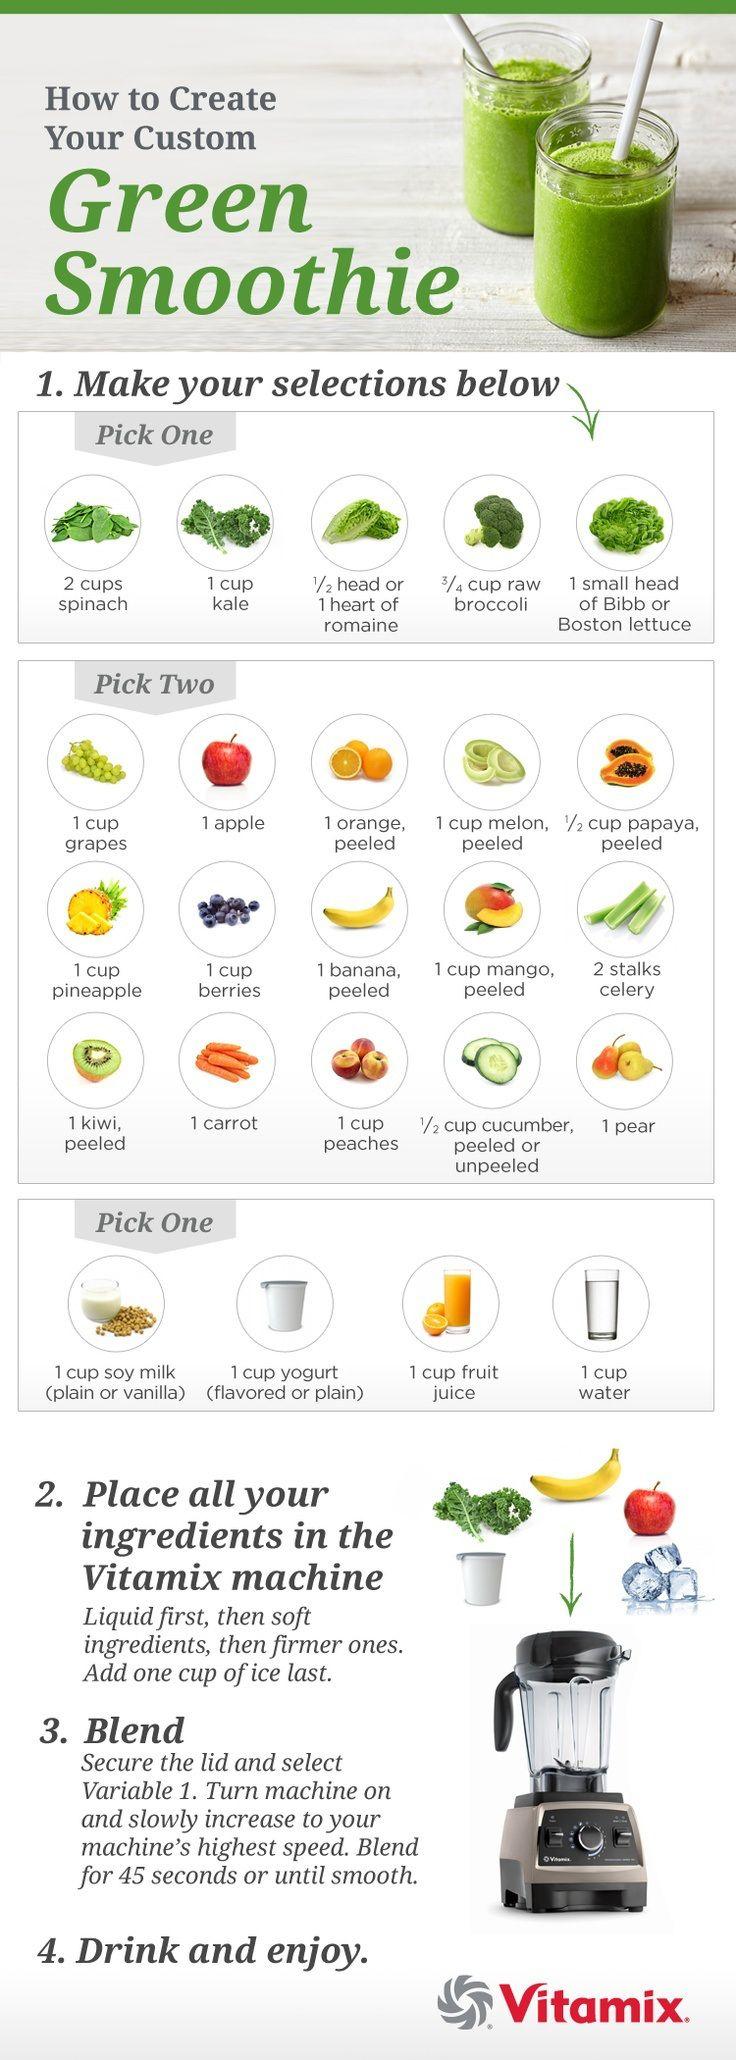 Vitamix Smoothie Guide